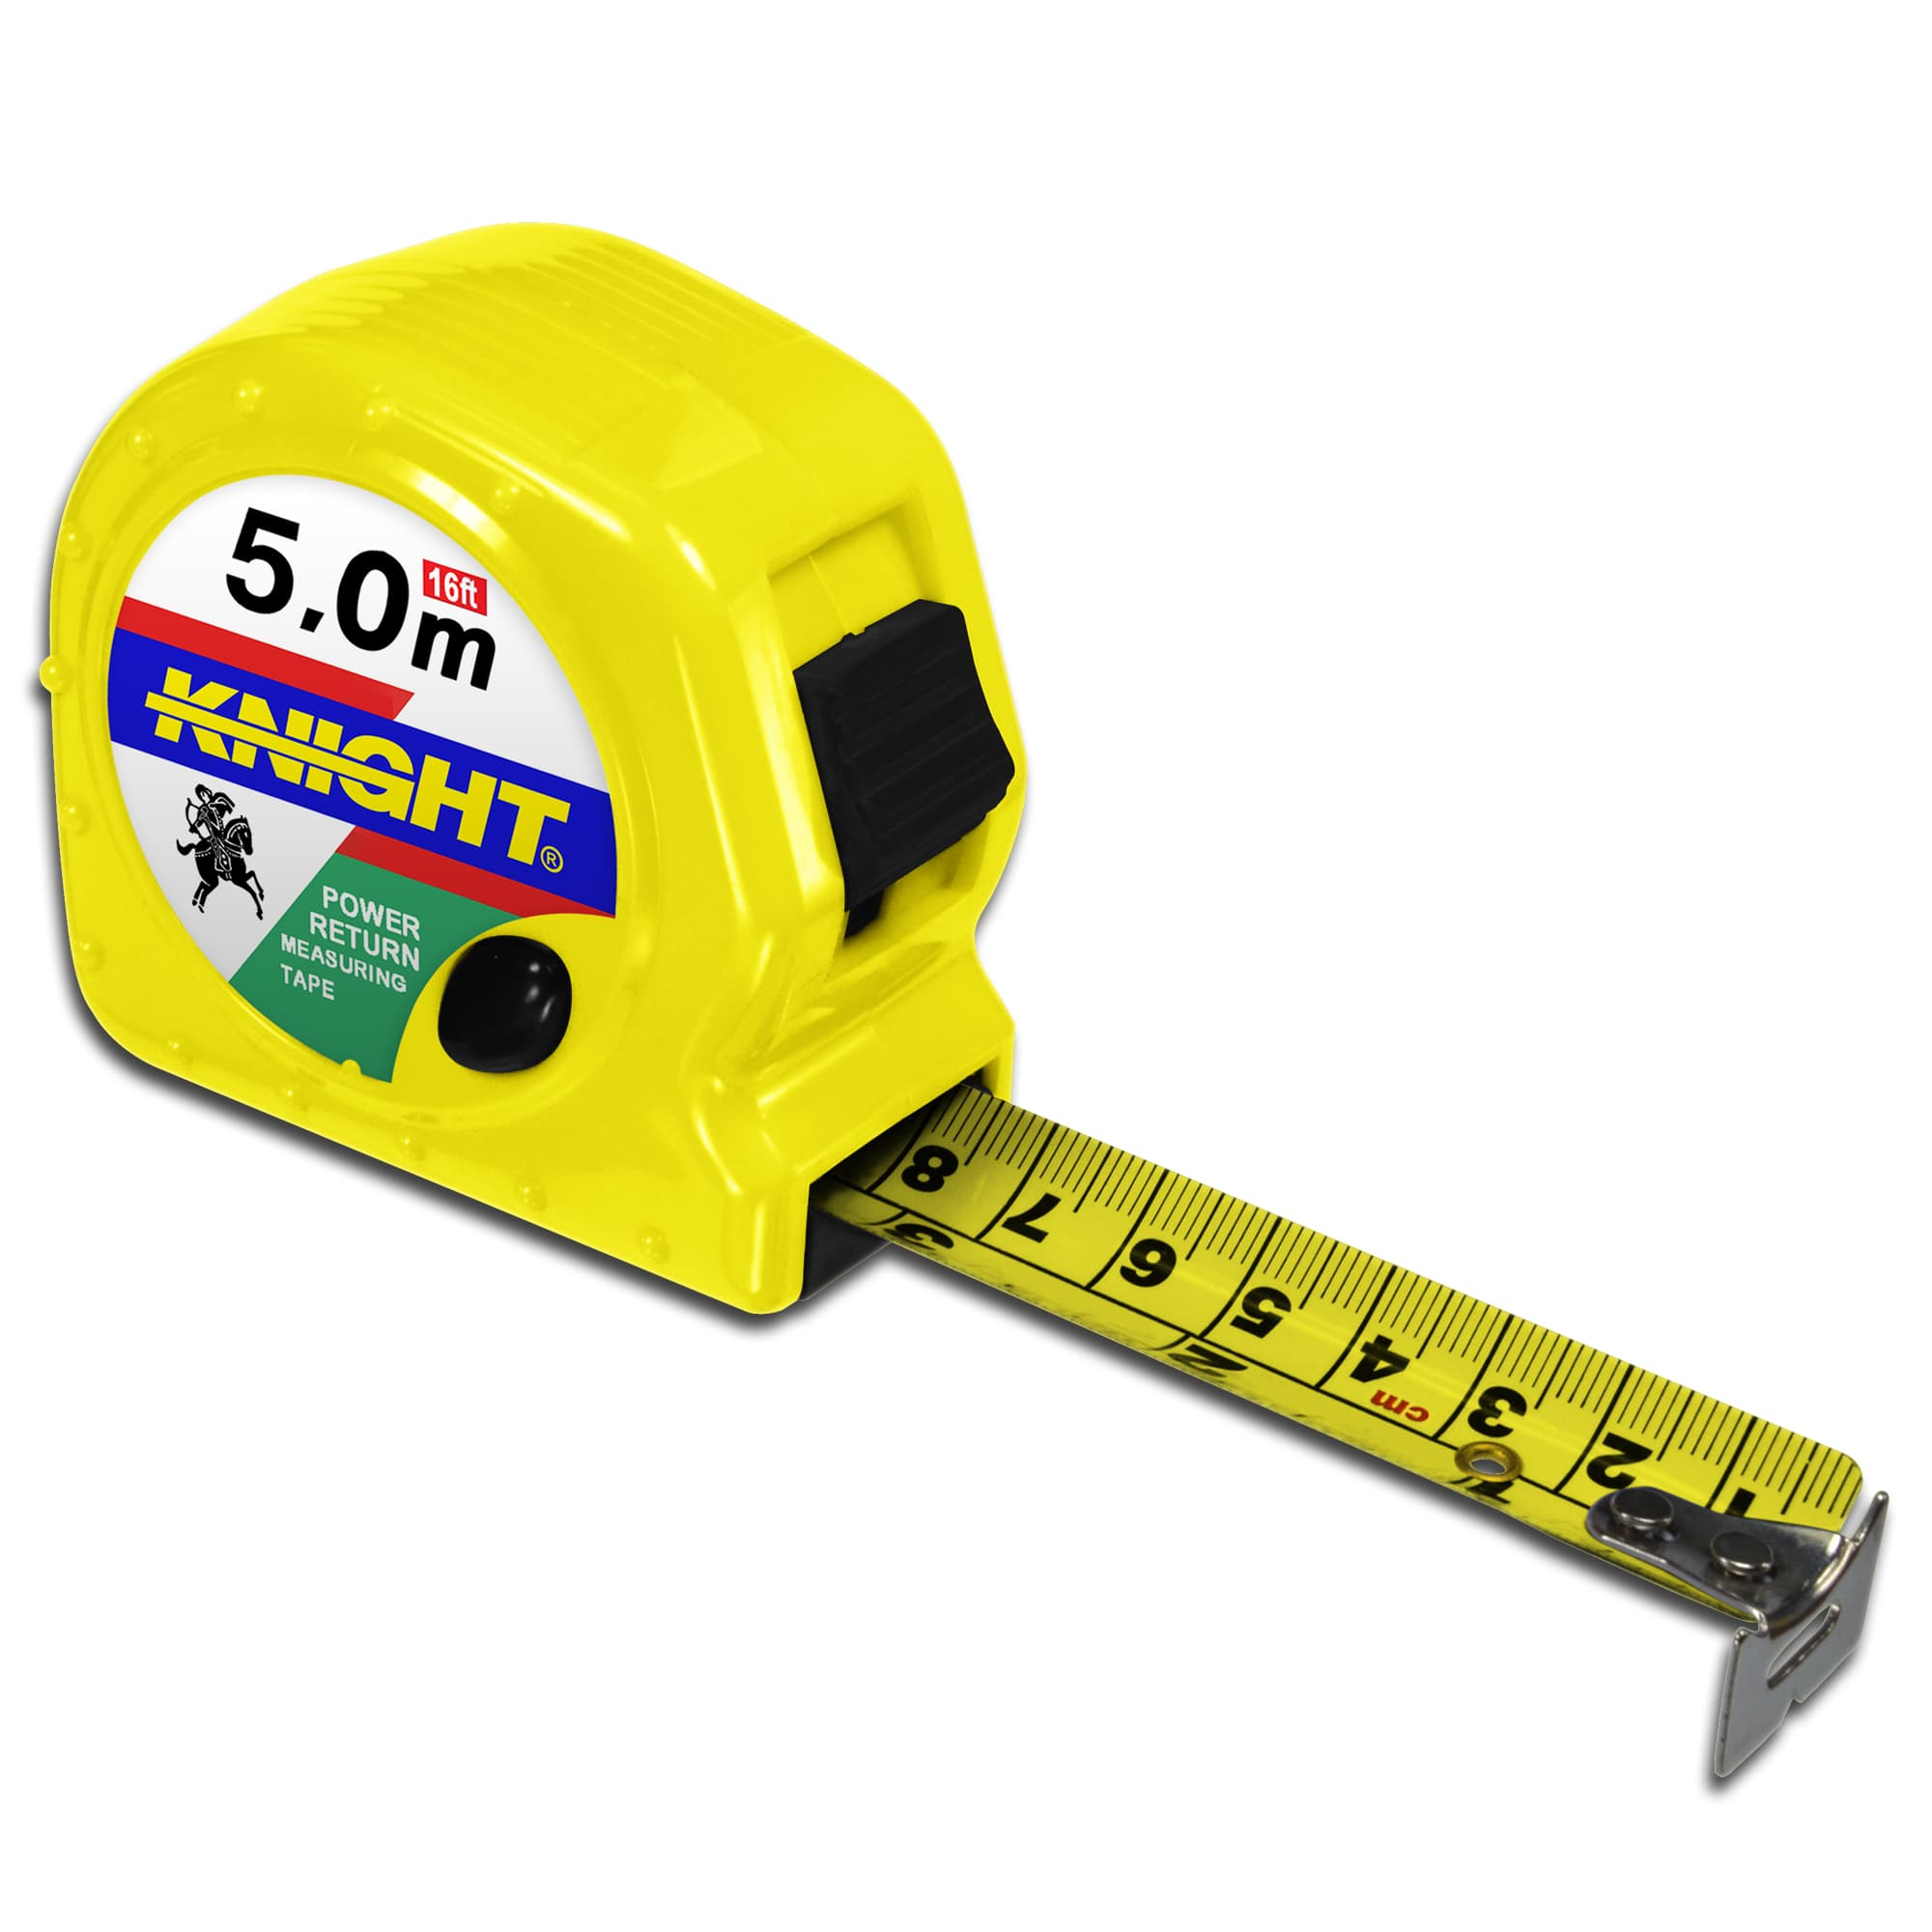 Handcraftsman Inch Meter Tape Measure